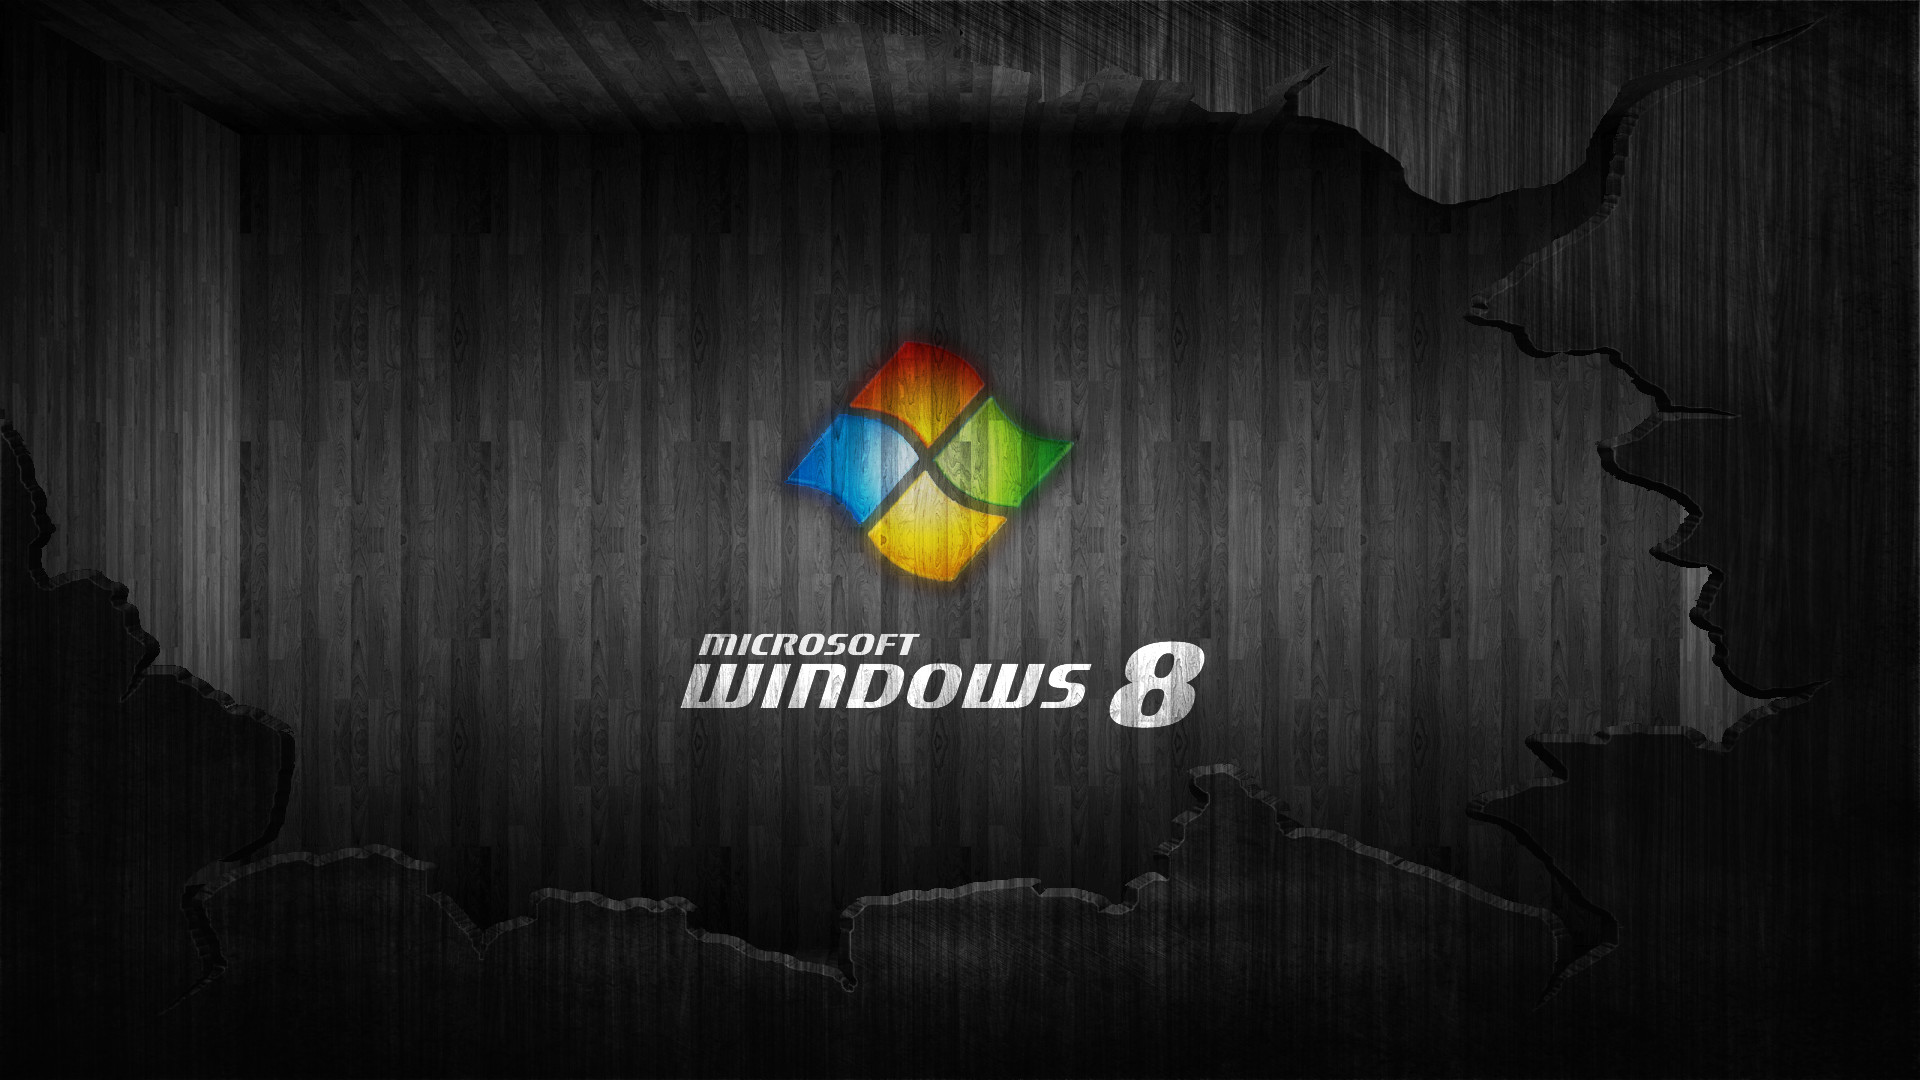 Wallpapers Windows 8 » Animaatjes.nl